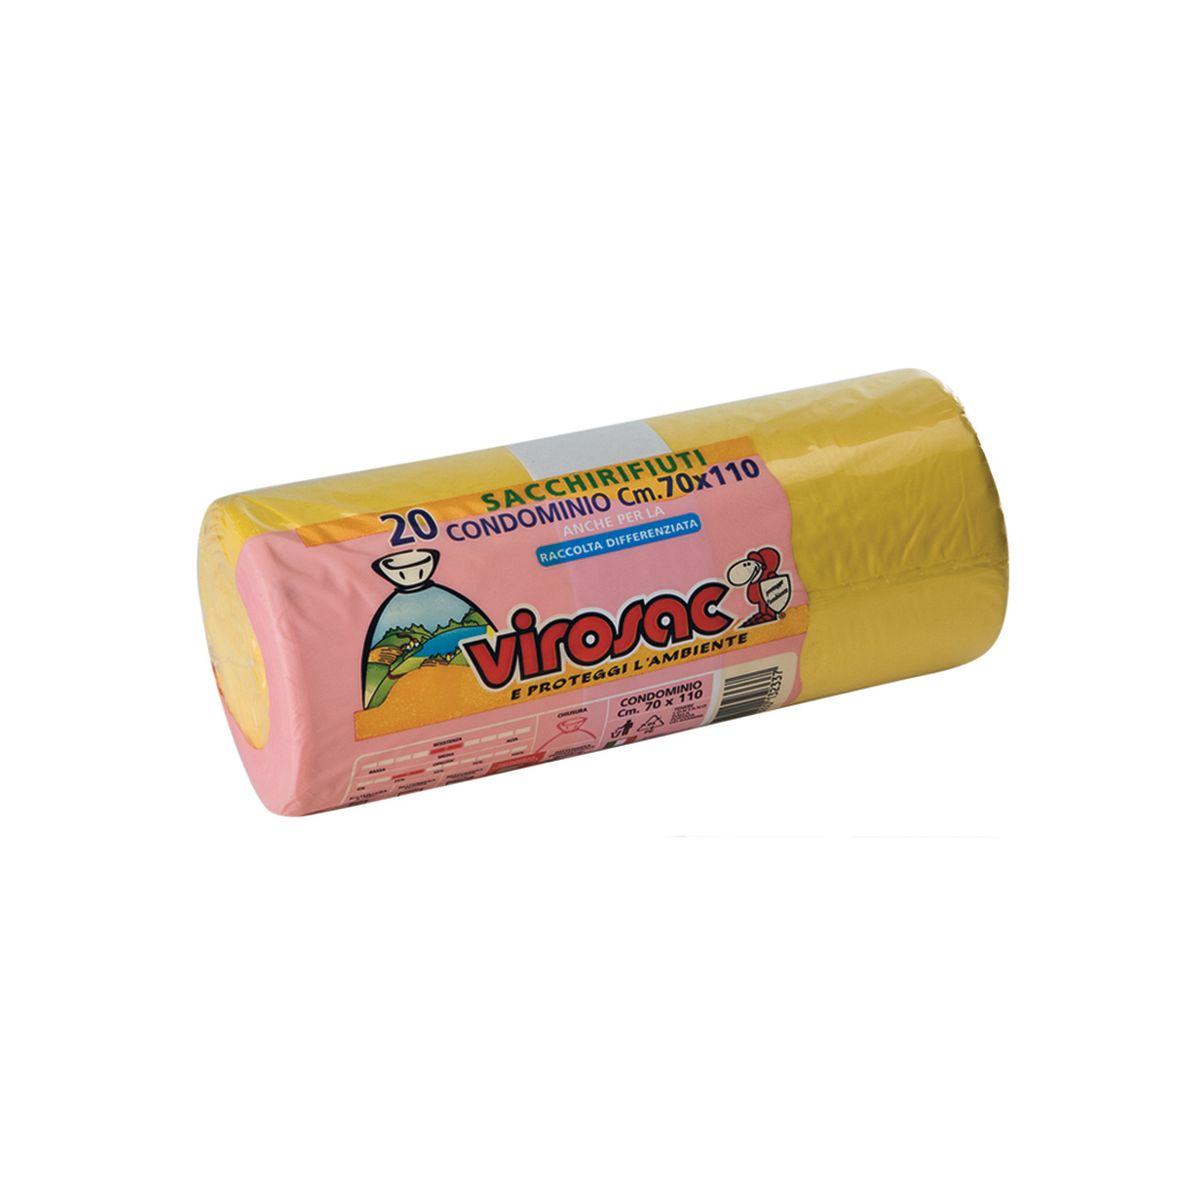 Sacco rifiuti rotolo condominio 110 x 70 cm giallo 20 for Erba a rotoli leroy merlin